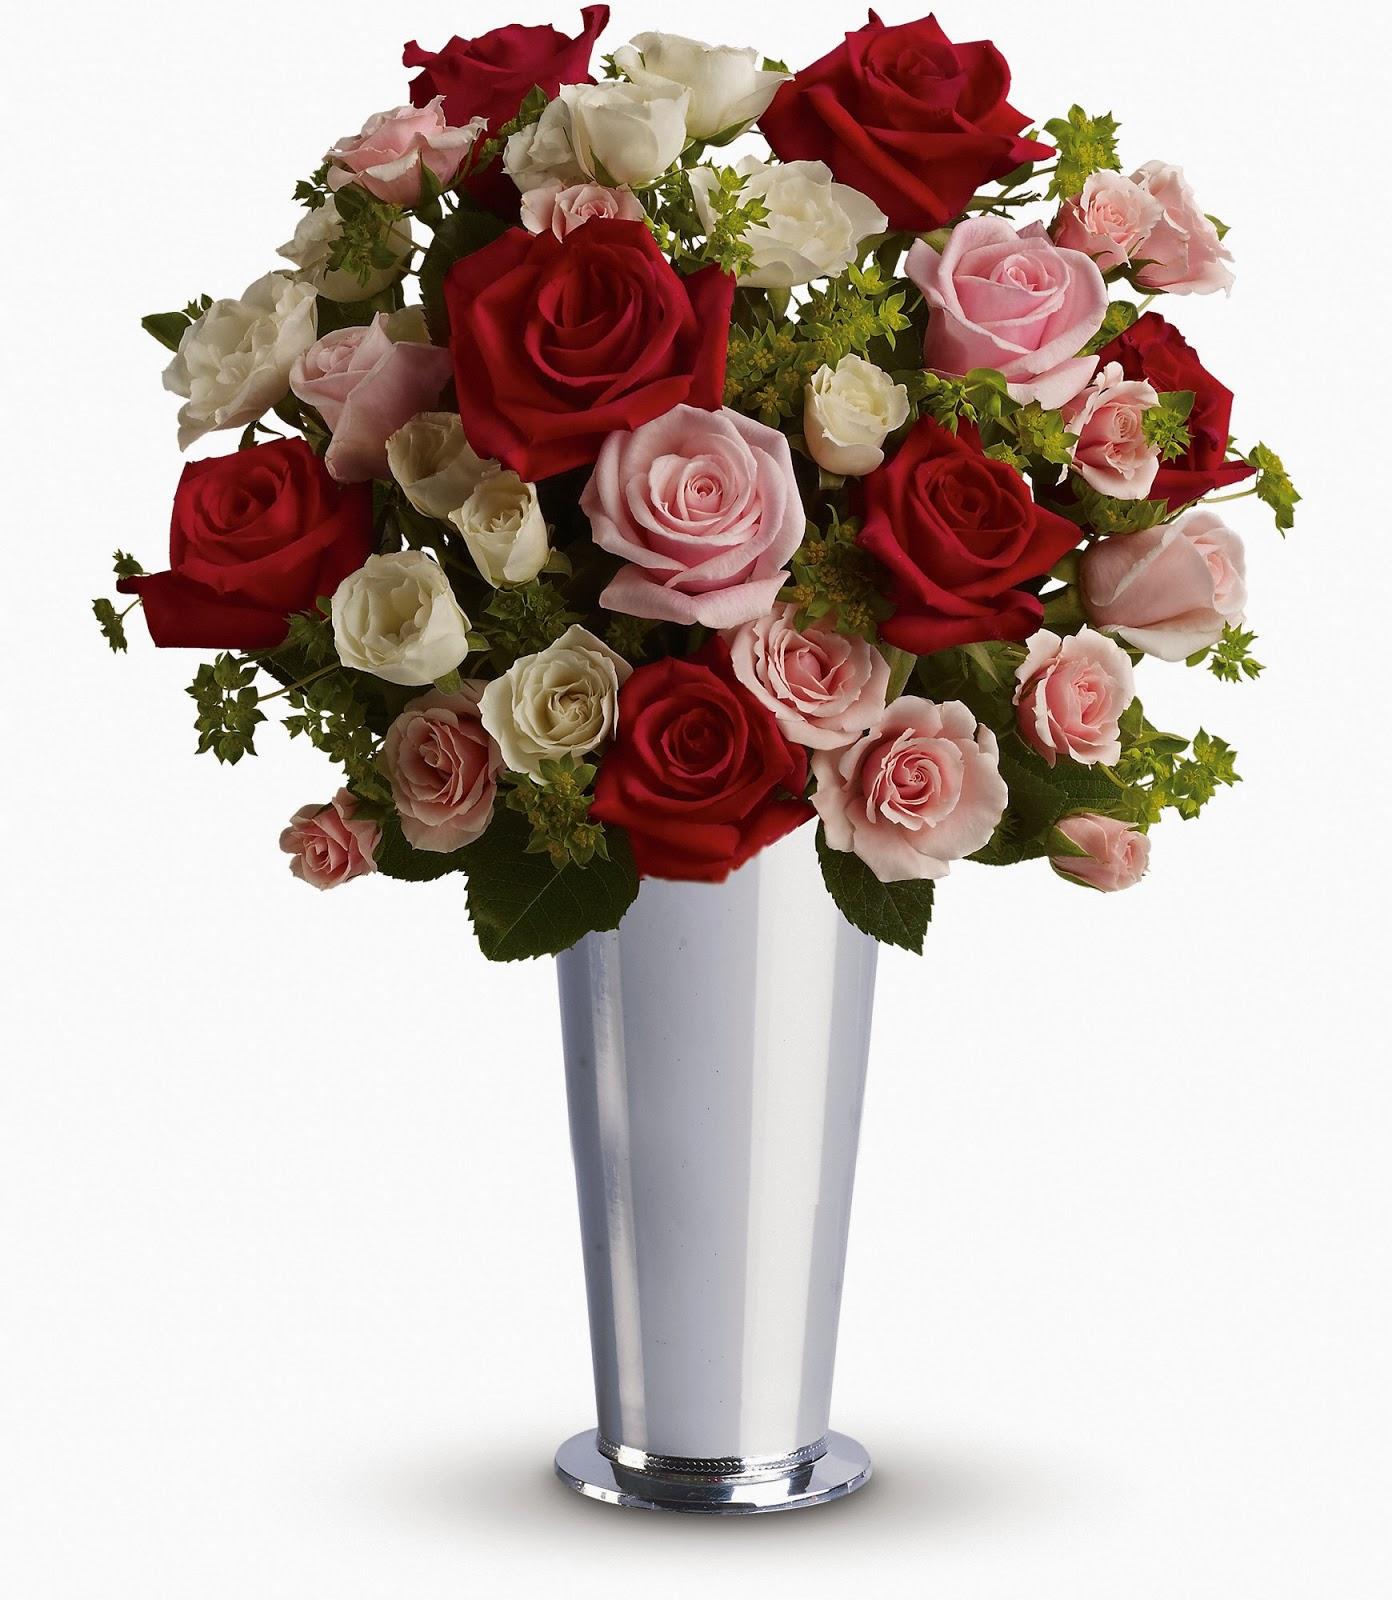 bloomex-ottawa-flower-reviews